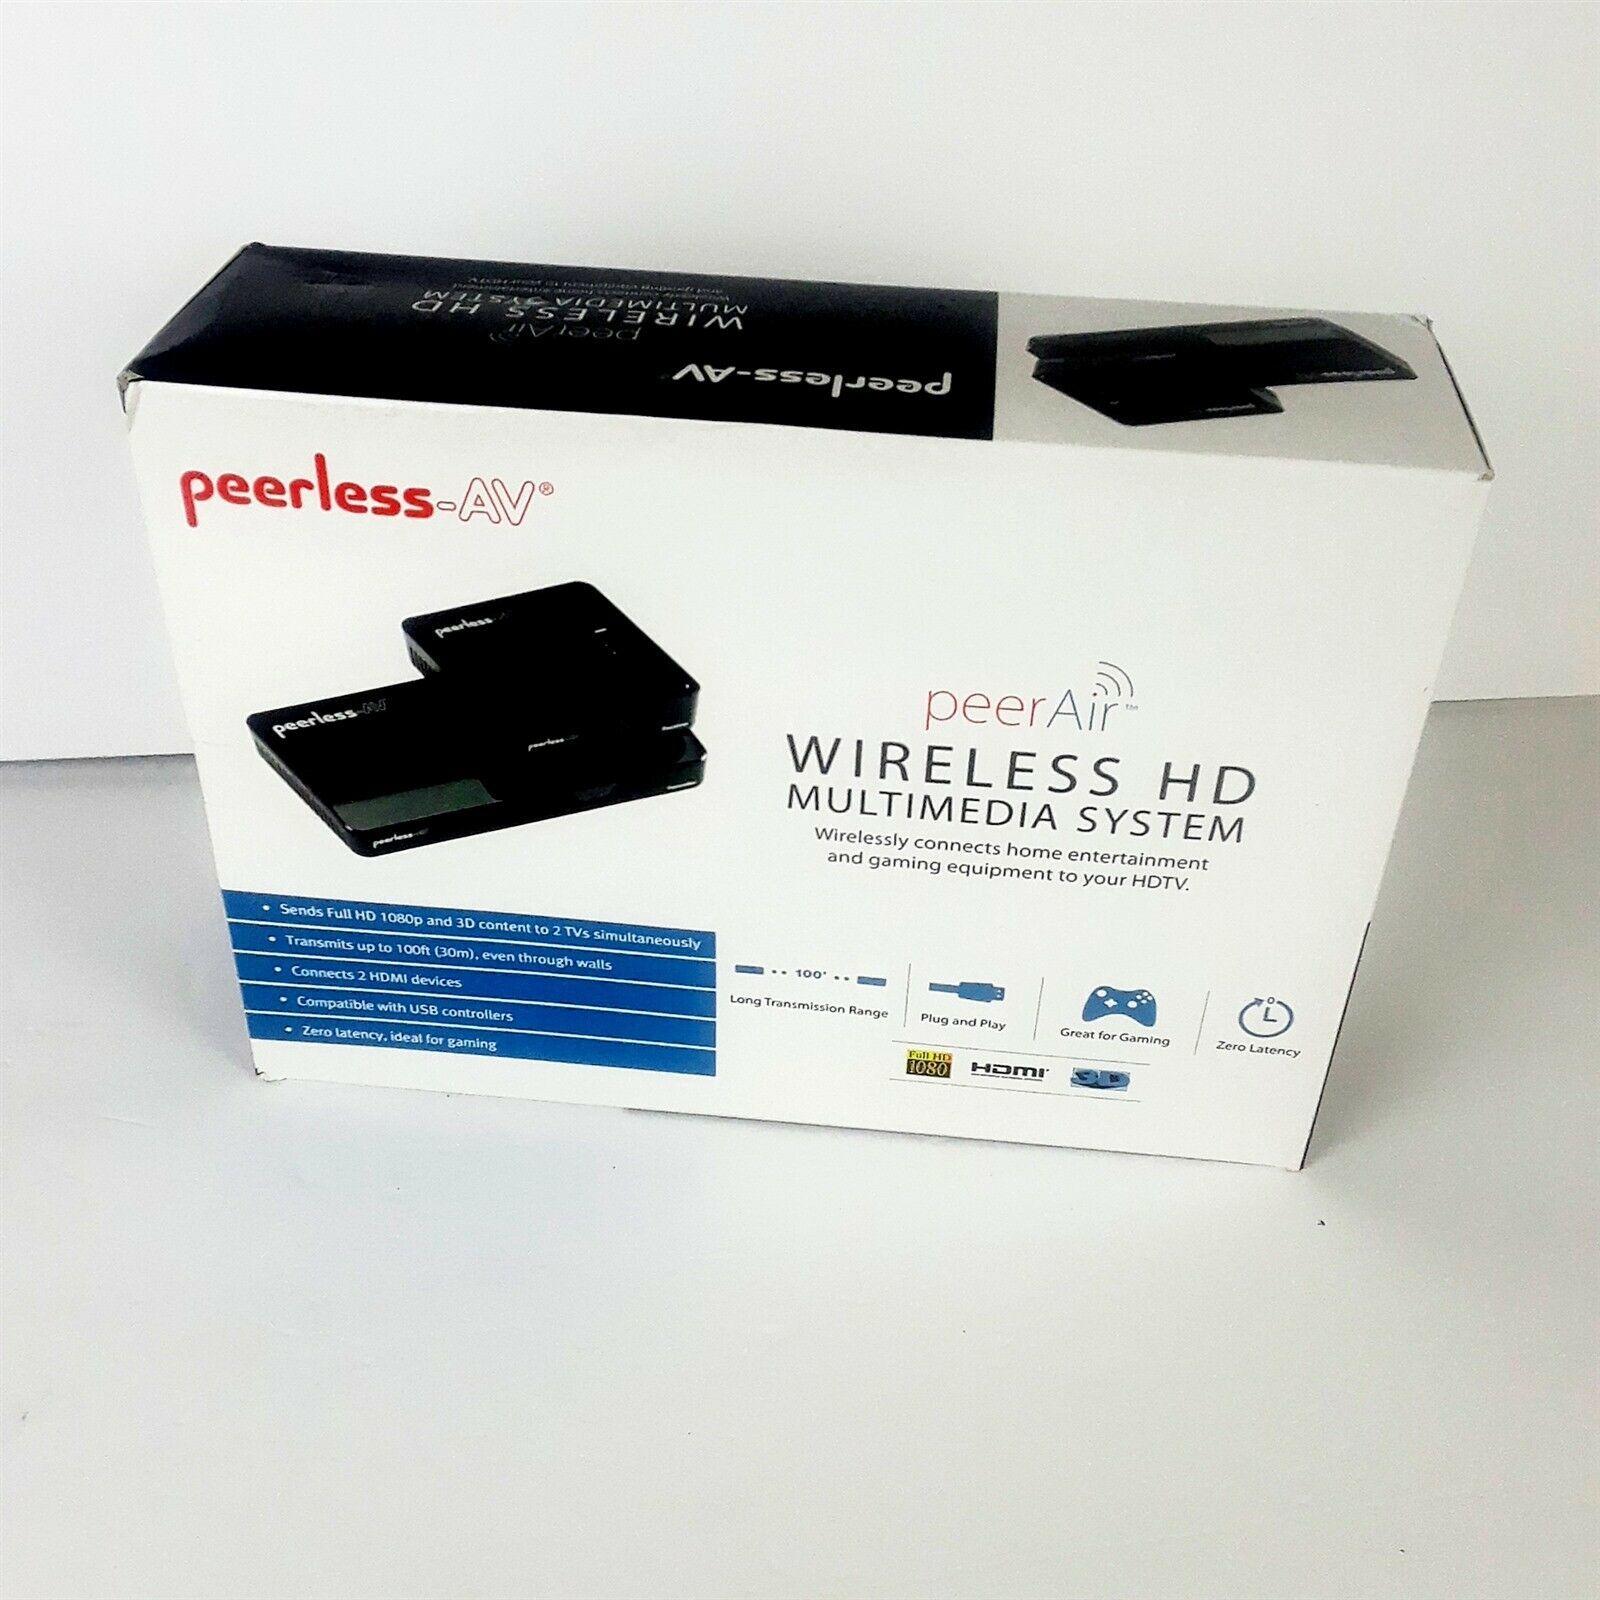 Peerless HDS-WHDI100 PeerAir Wireless HD Multimedia System, Gloss Black